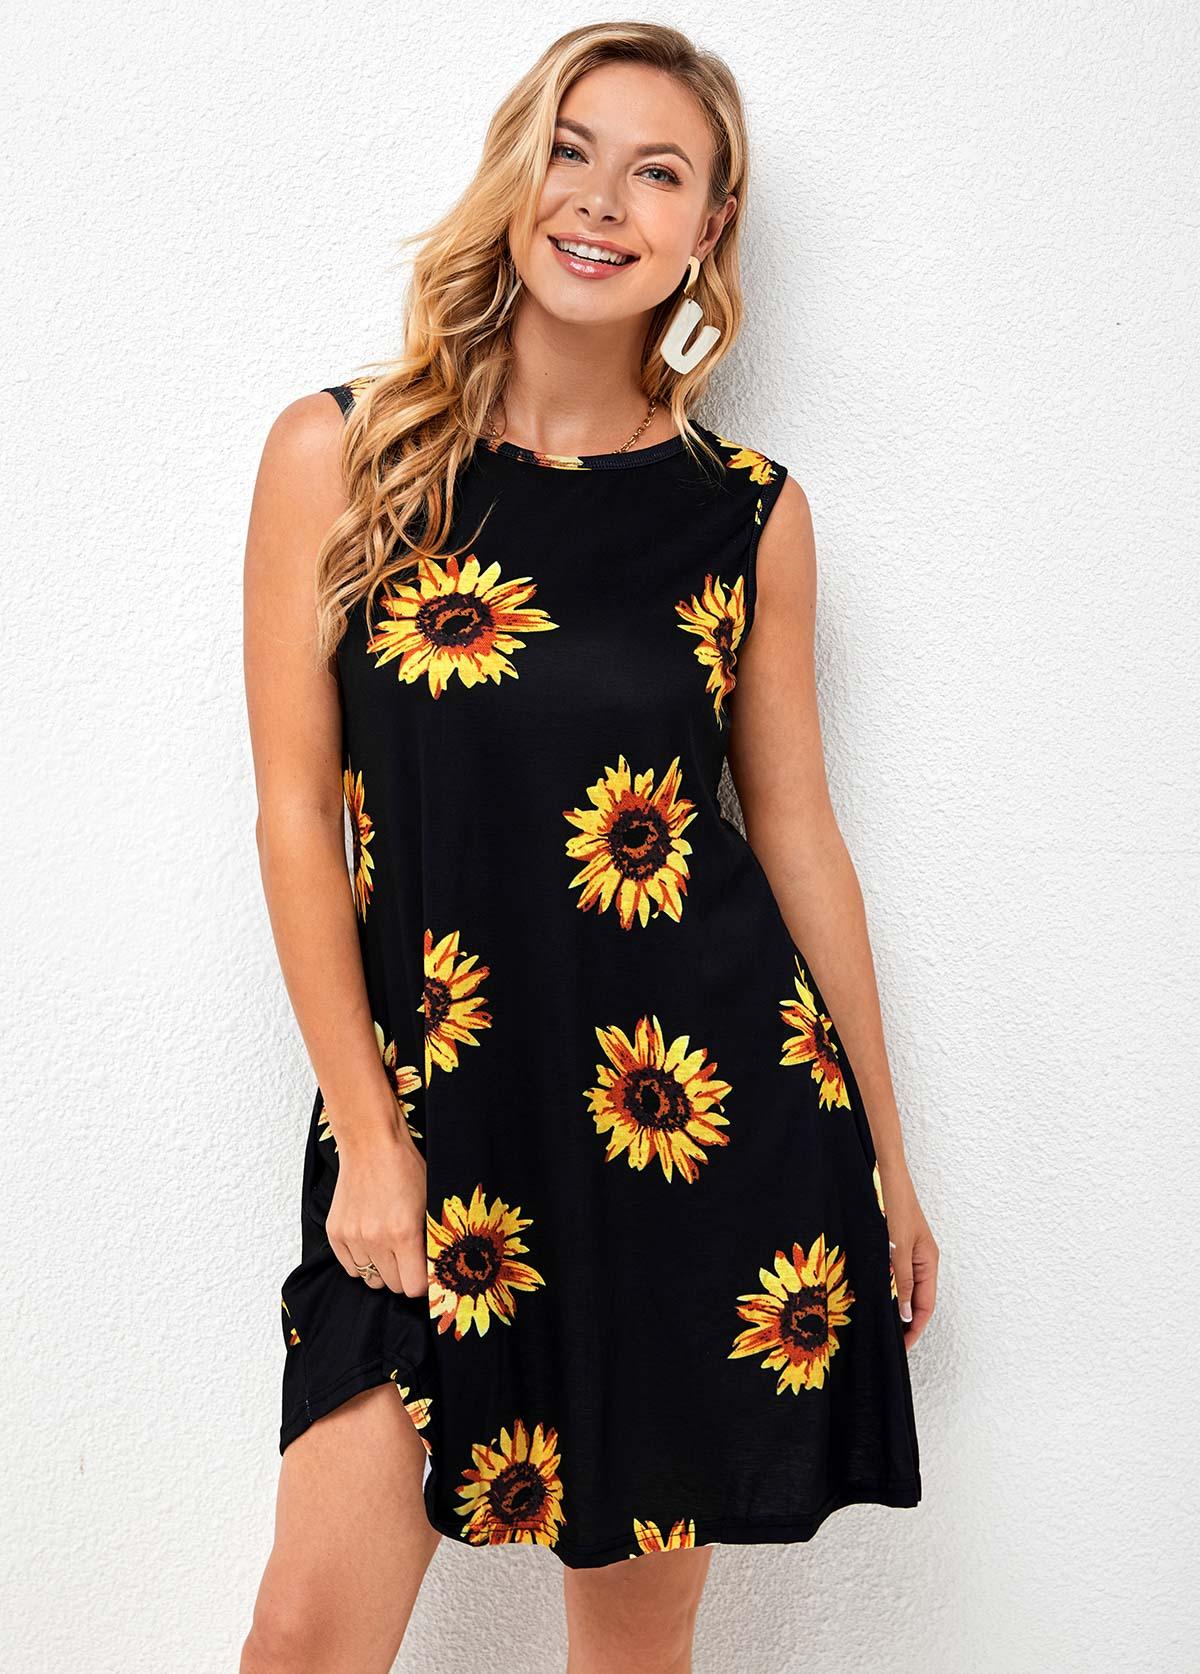 Sunflower Print Sleeveless Round Neck Dress